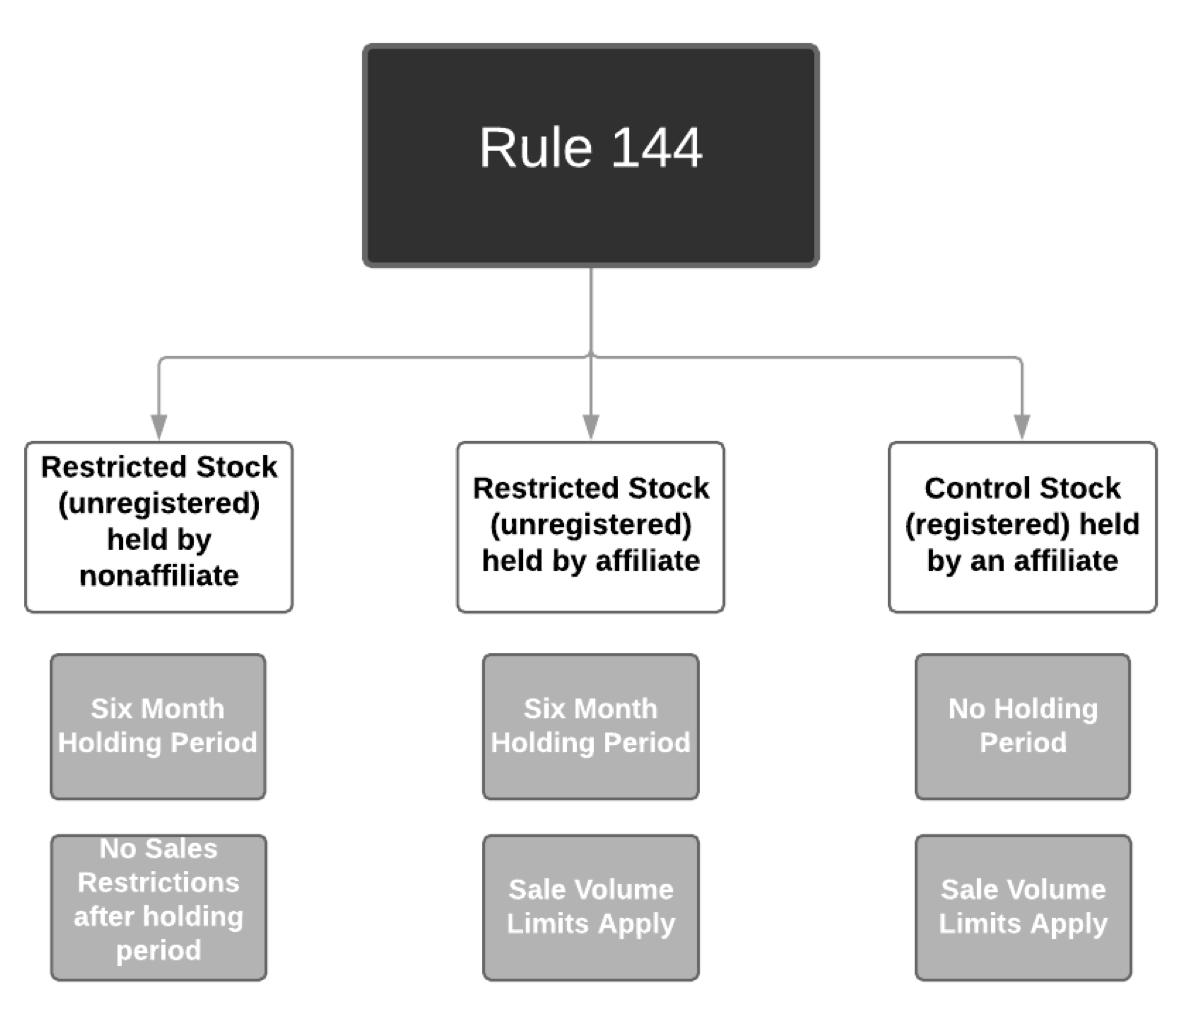 Rule 144